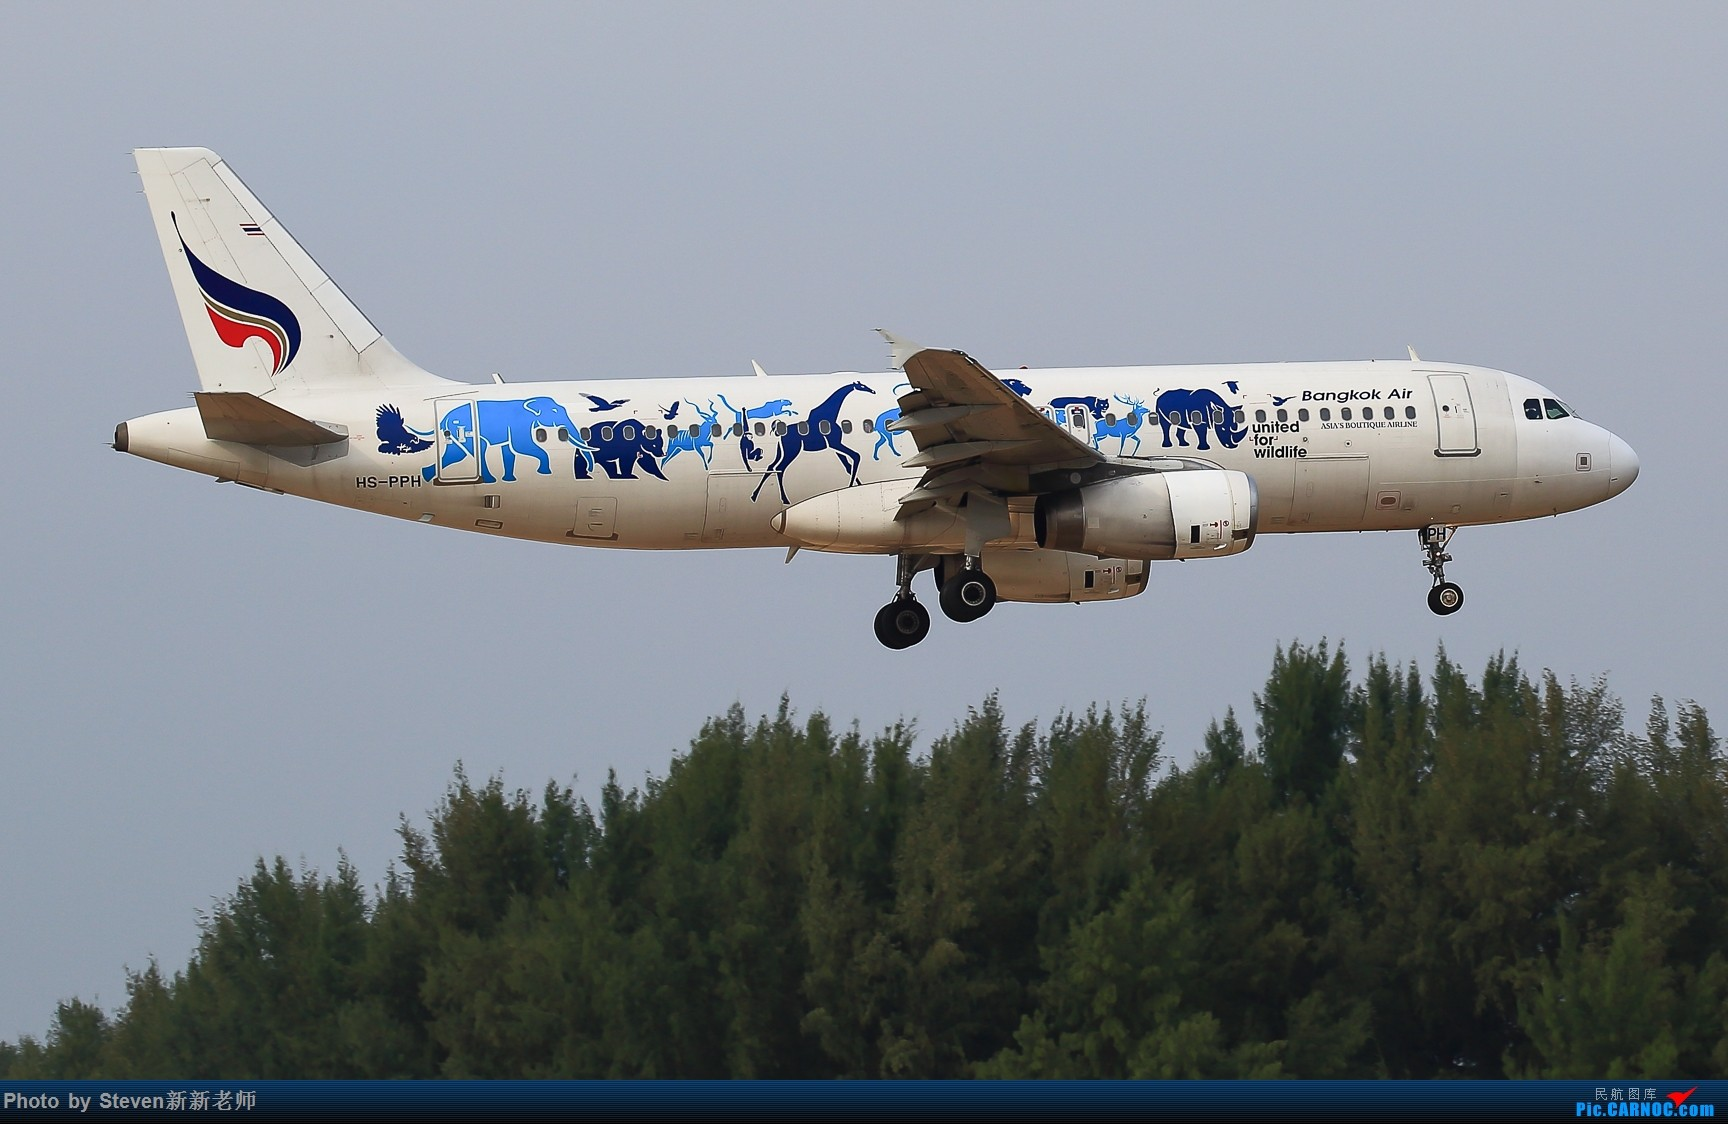 "Re:[原创]亚洲""圣马丁岛""—普吉国际机场拍机 AIRBUS A320-200 HS-PPH 泰国普吉机场"